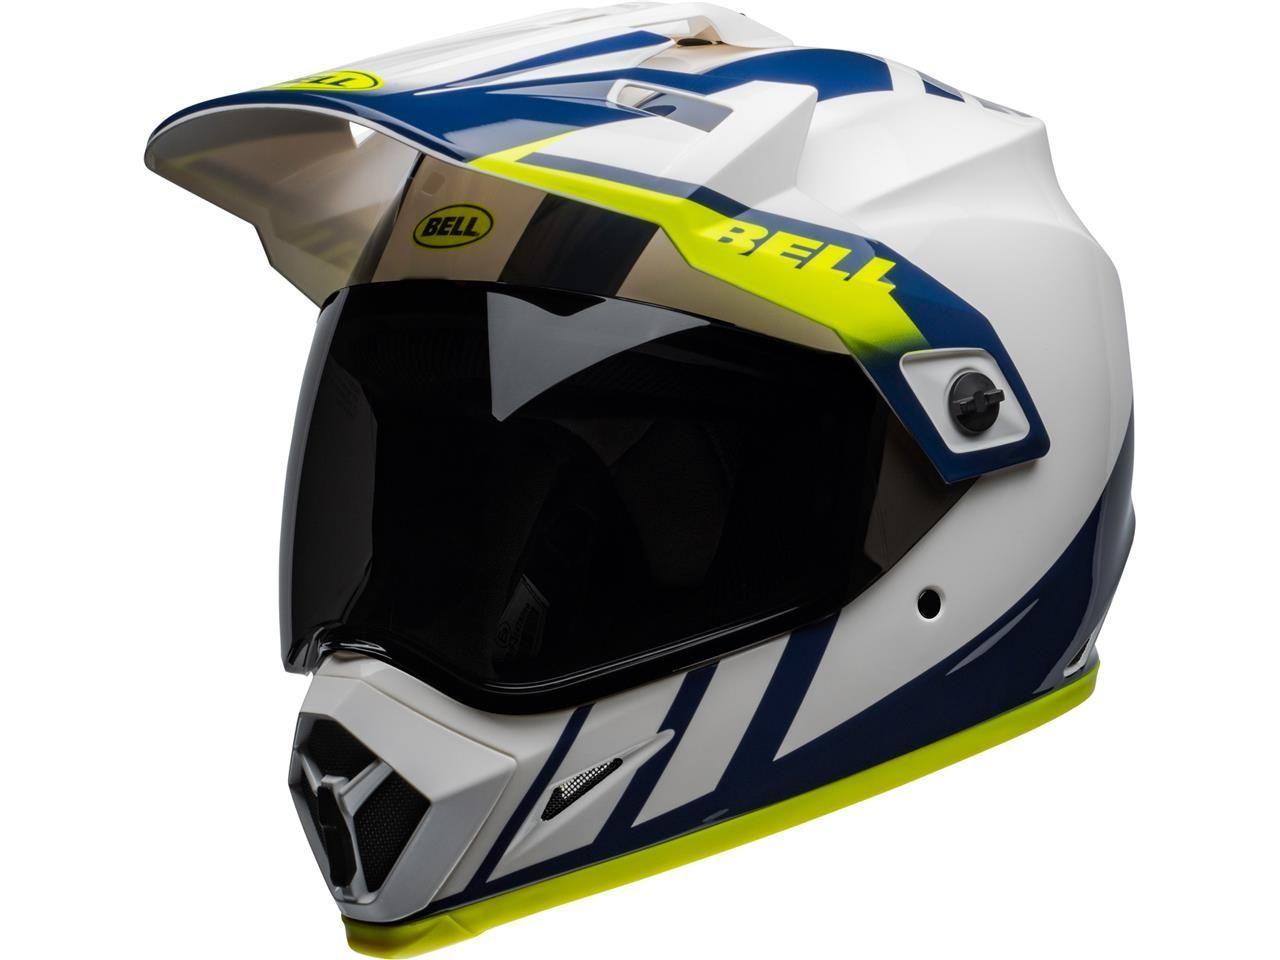 Bell Crosshelm/Endurohelm MX-9 Adventure MIPS® Dash Gloss White/Blue/Hi Viz